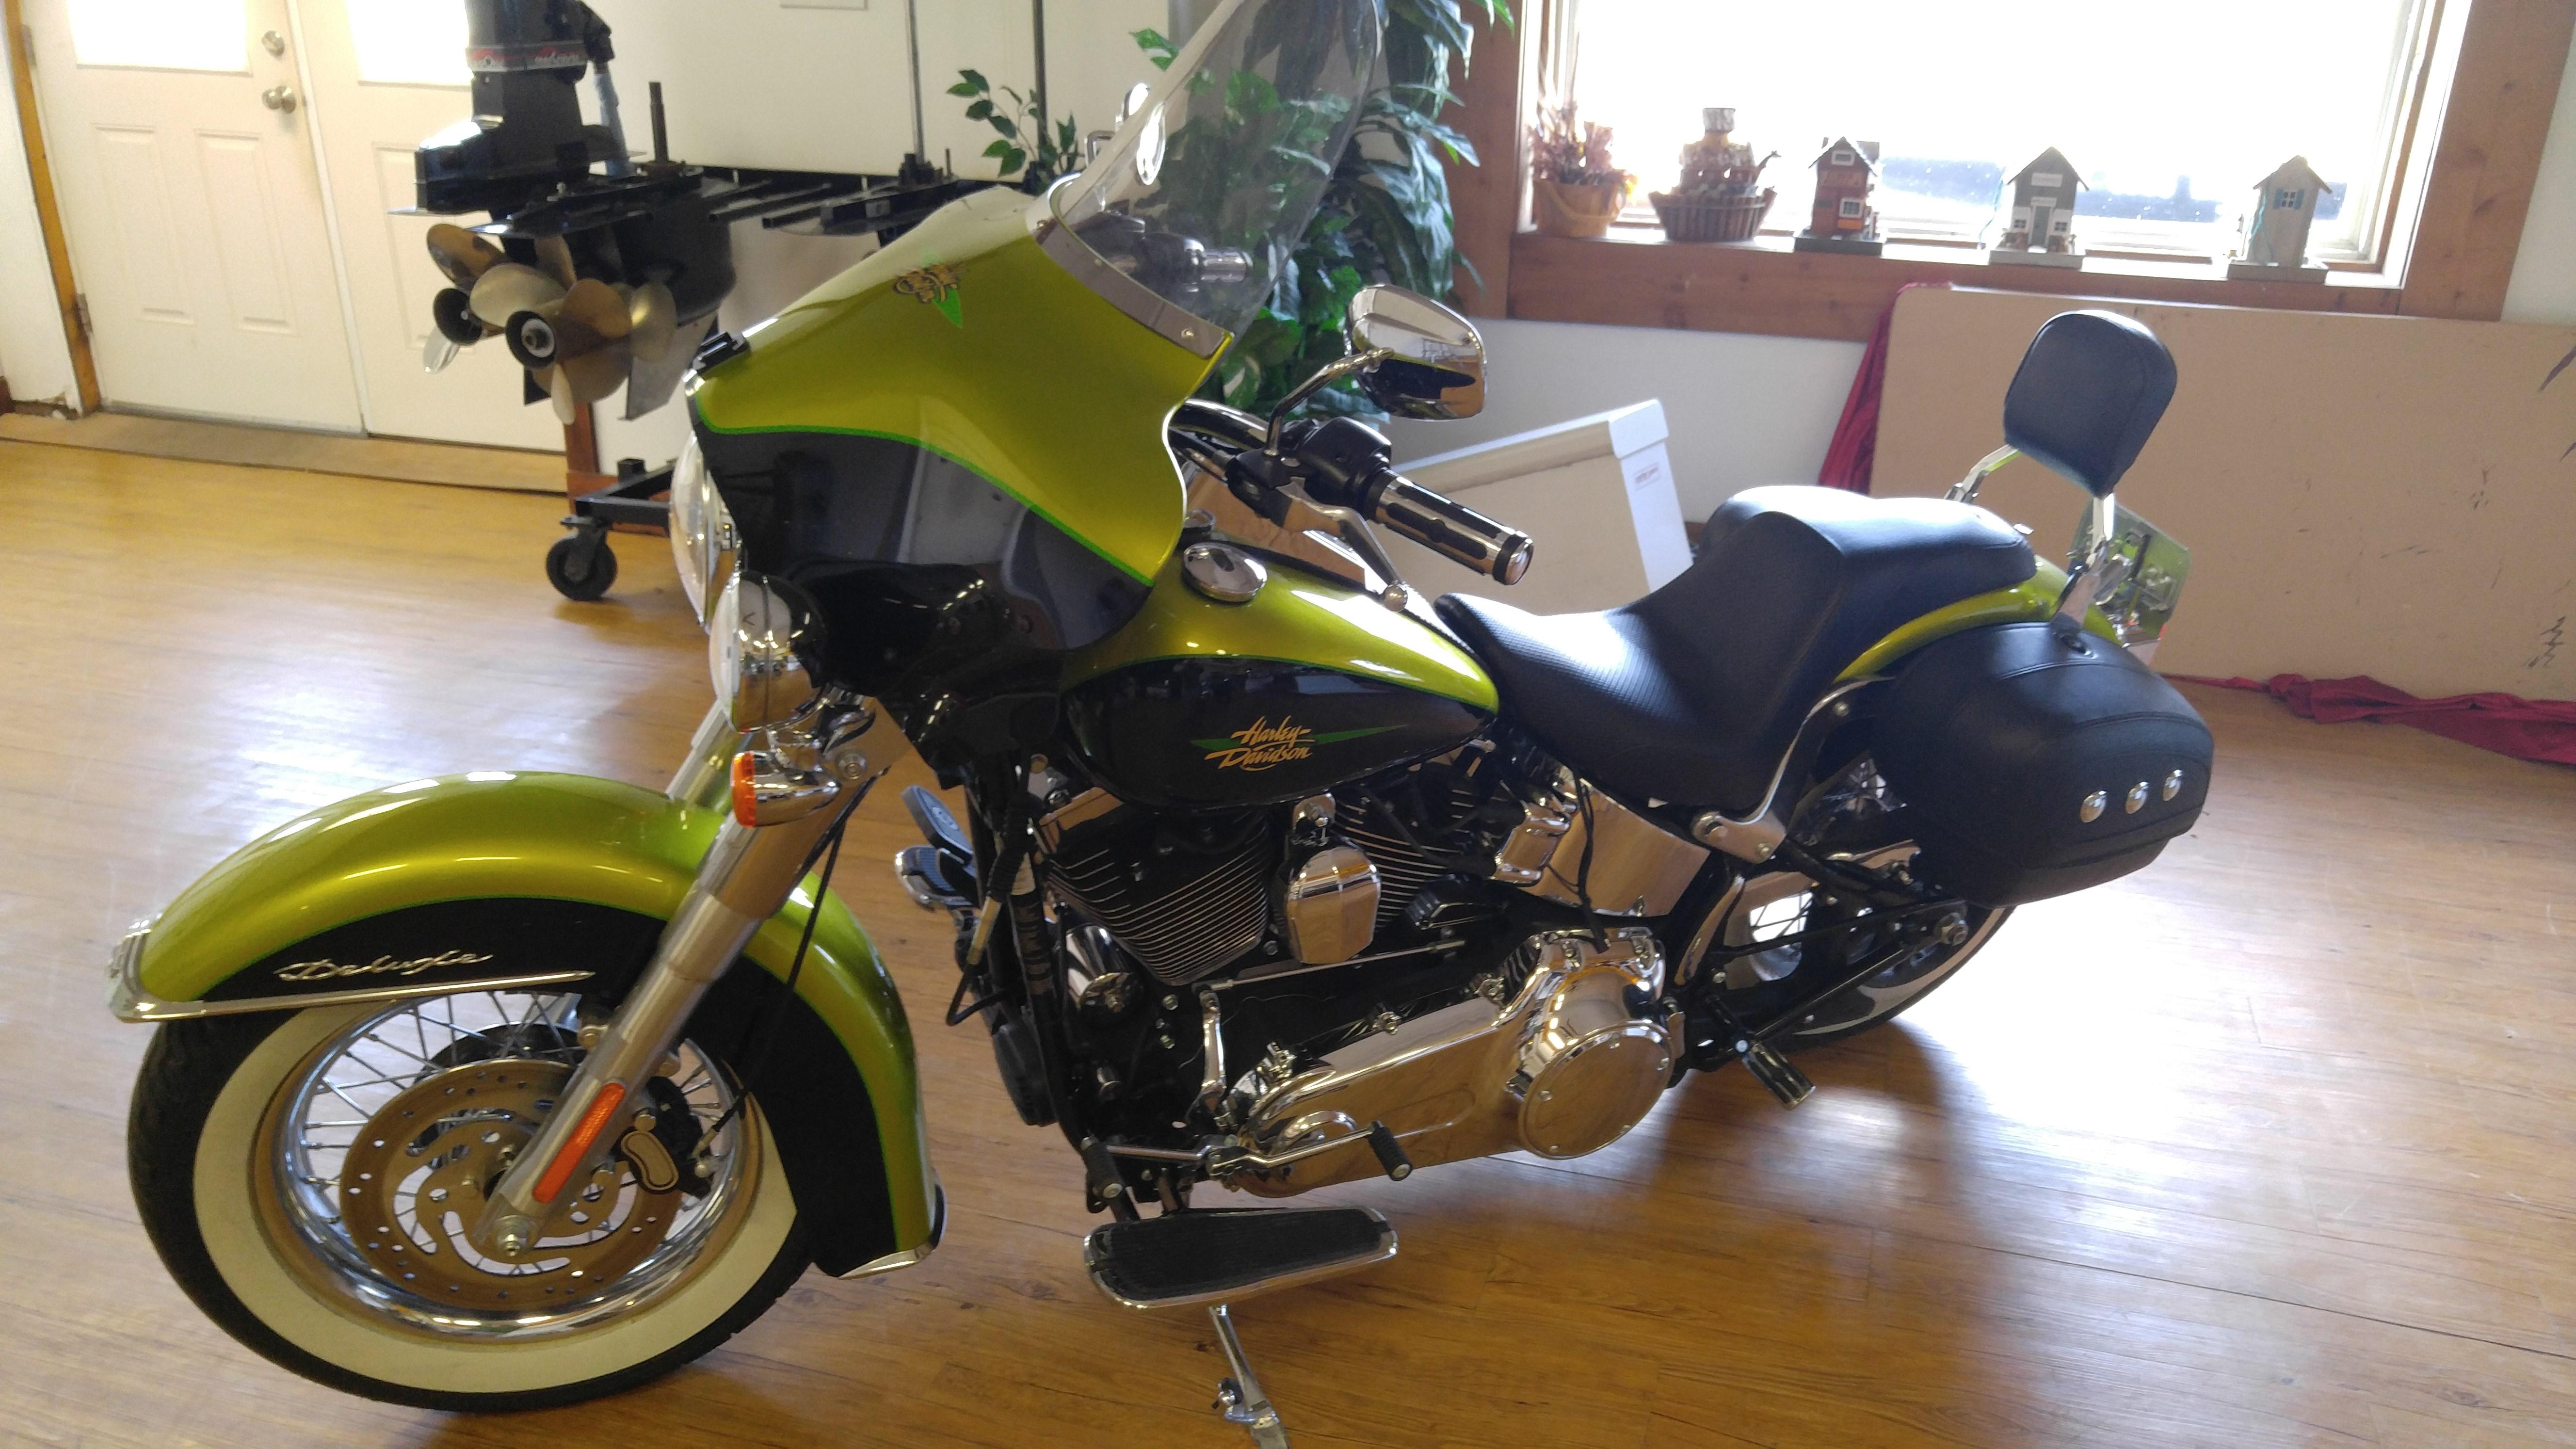 Harley Davidson Chico Ca >> 2011 Harley-Davidson® FLSTN Softail® Deluxe (Candy Apple Green and Black), belleville, Illinois ...